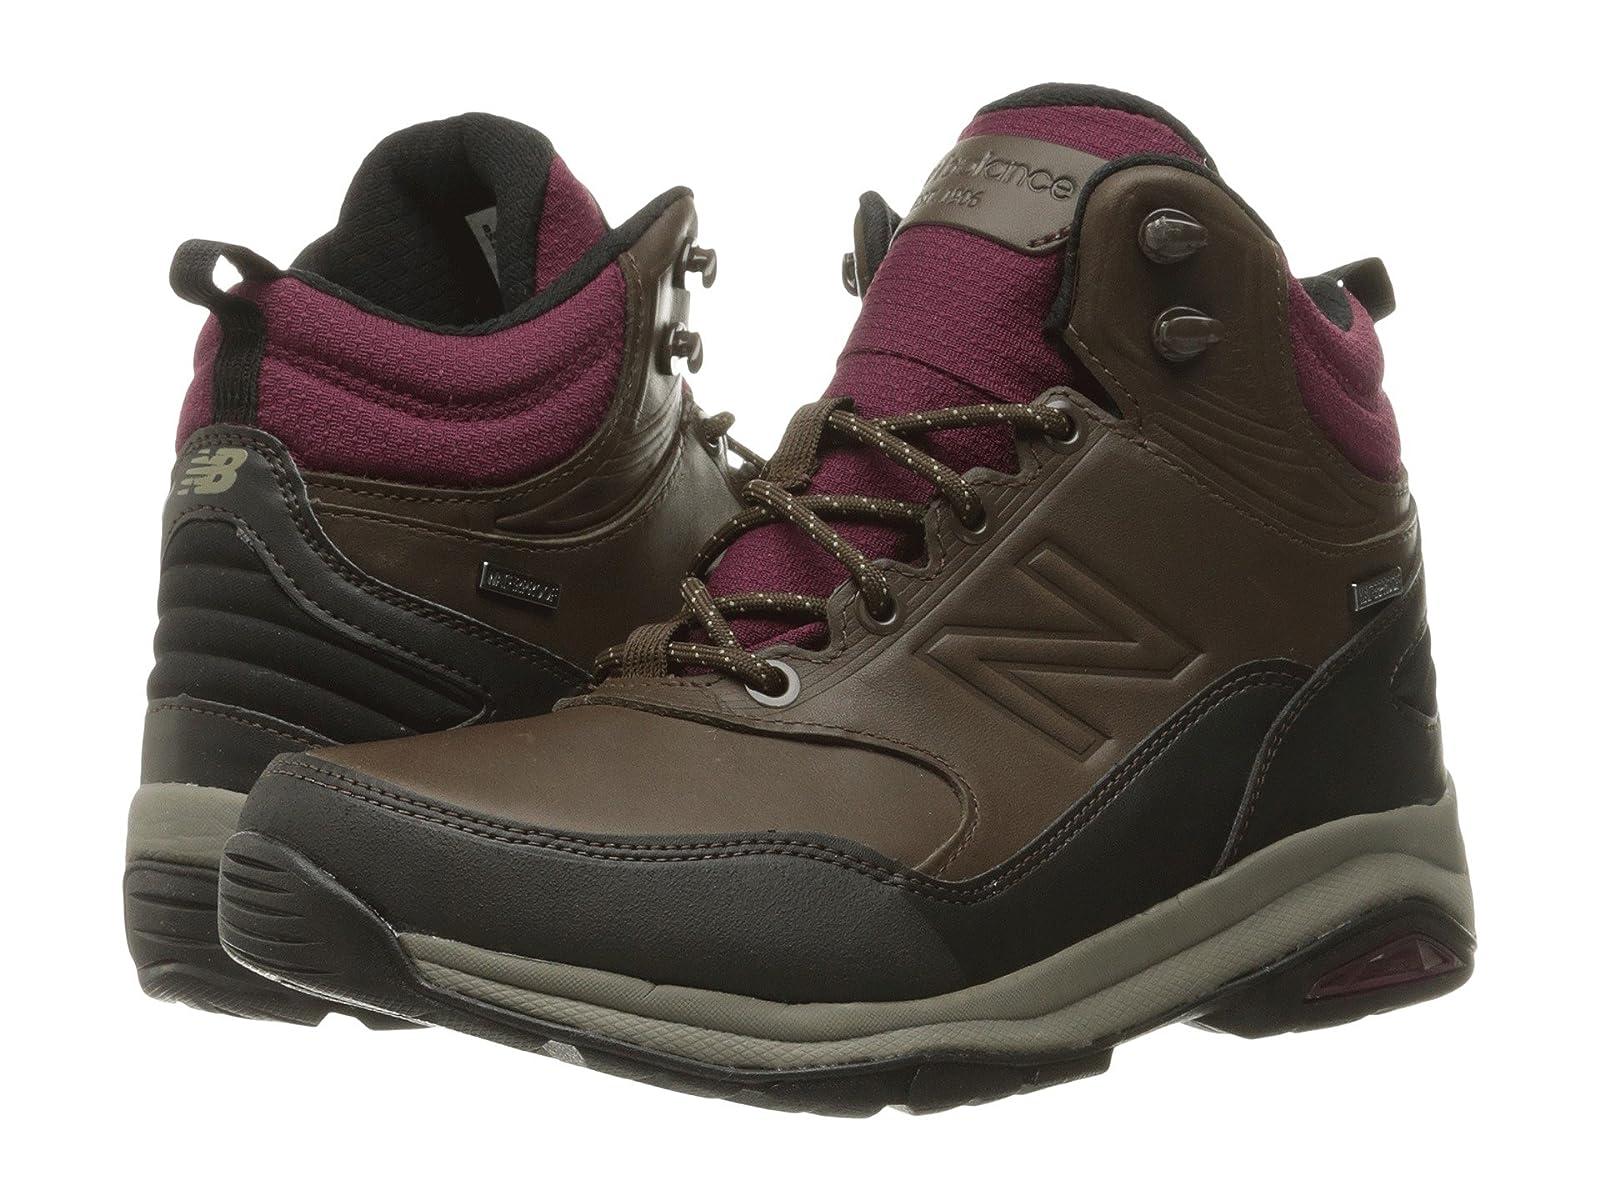 New Balance WW1400v1Economical and quality shoes